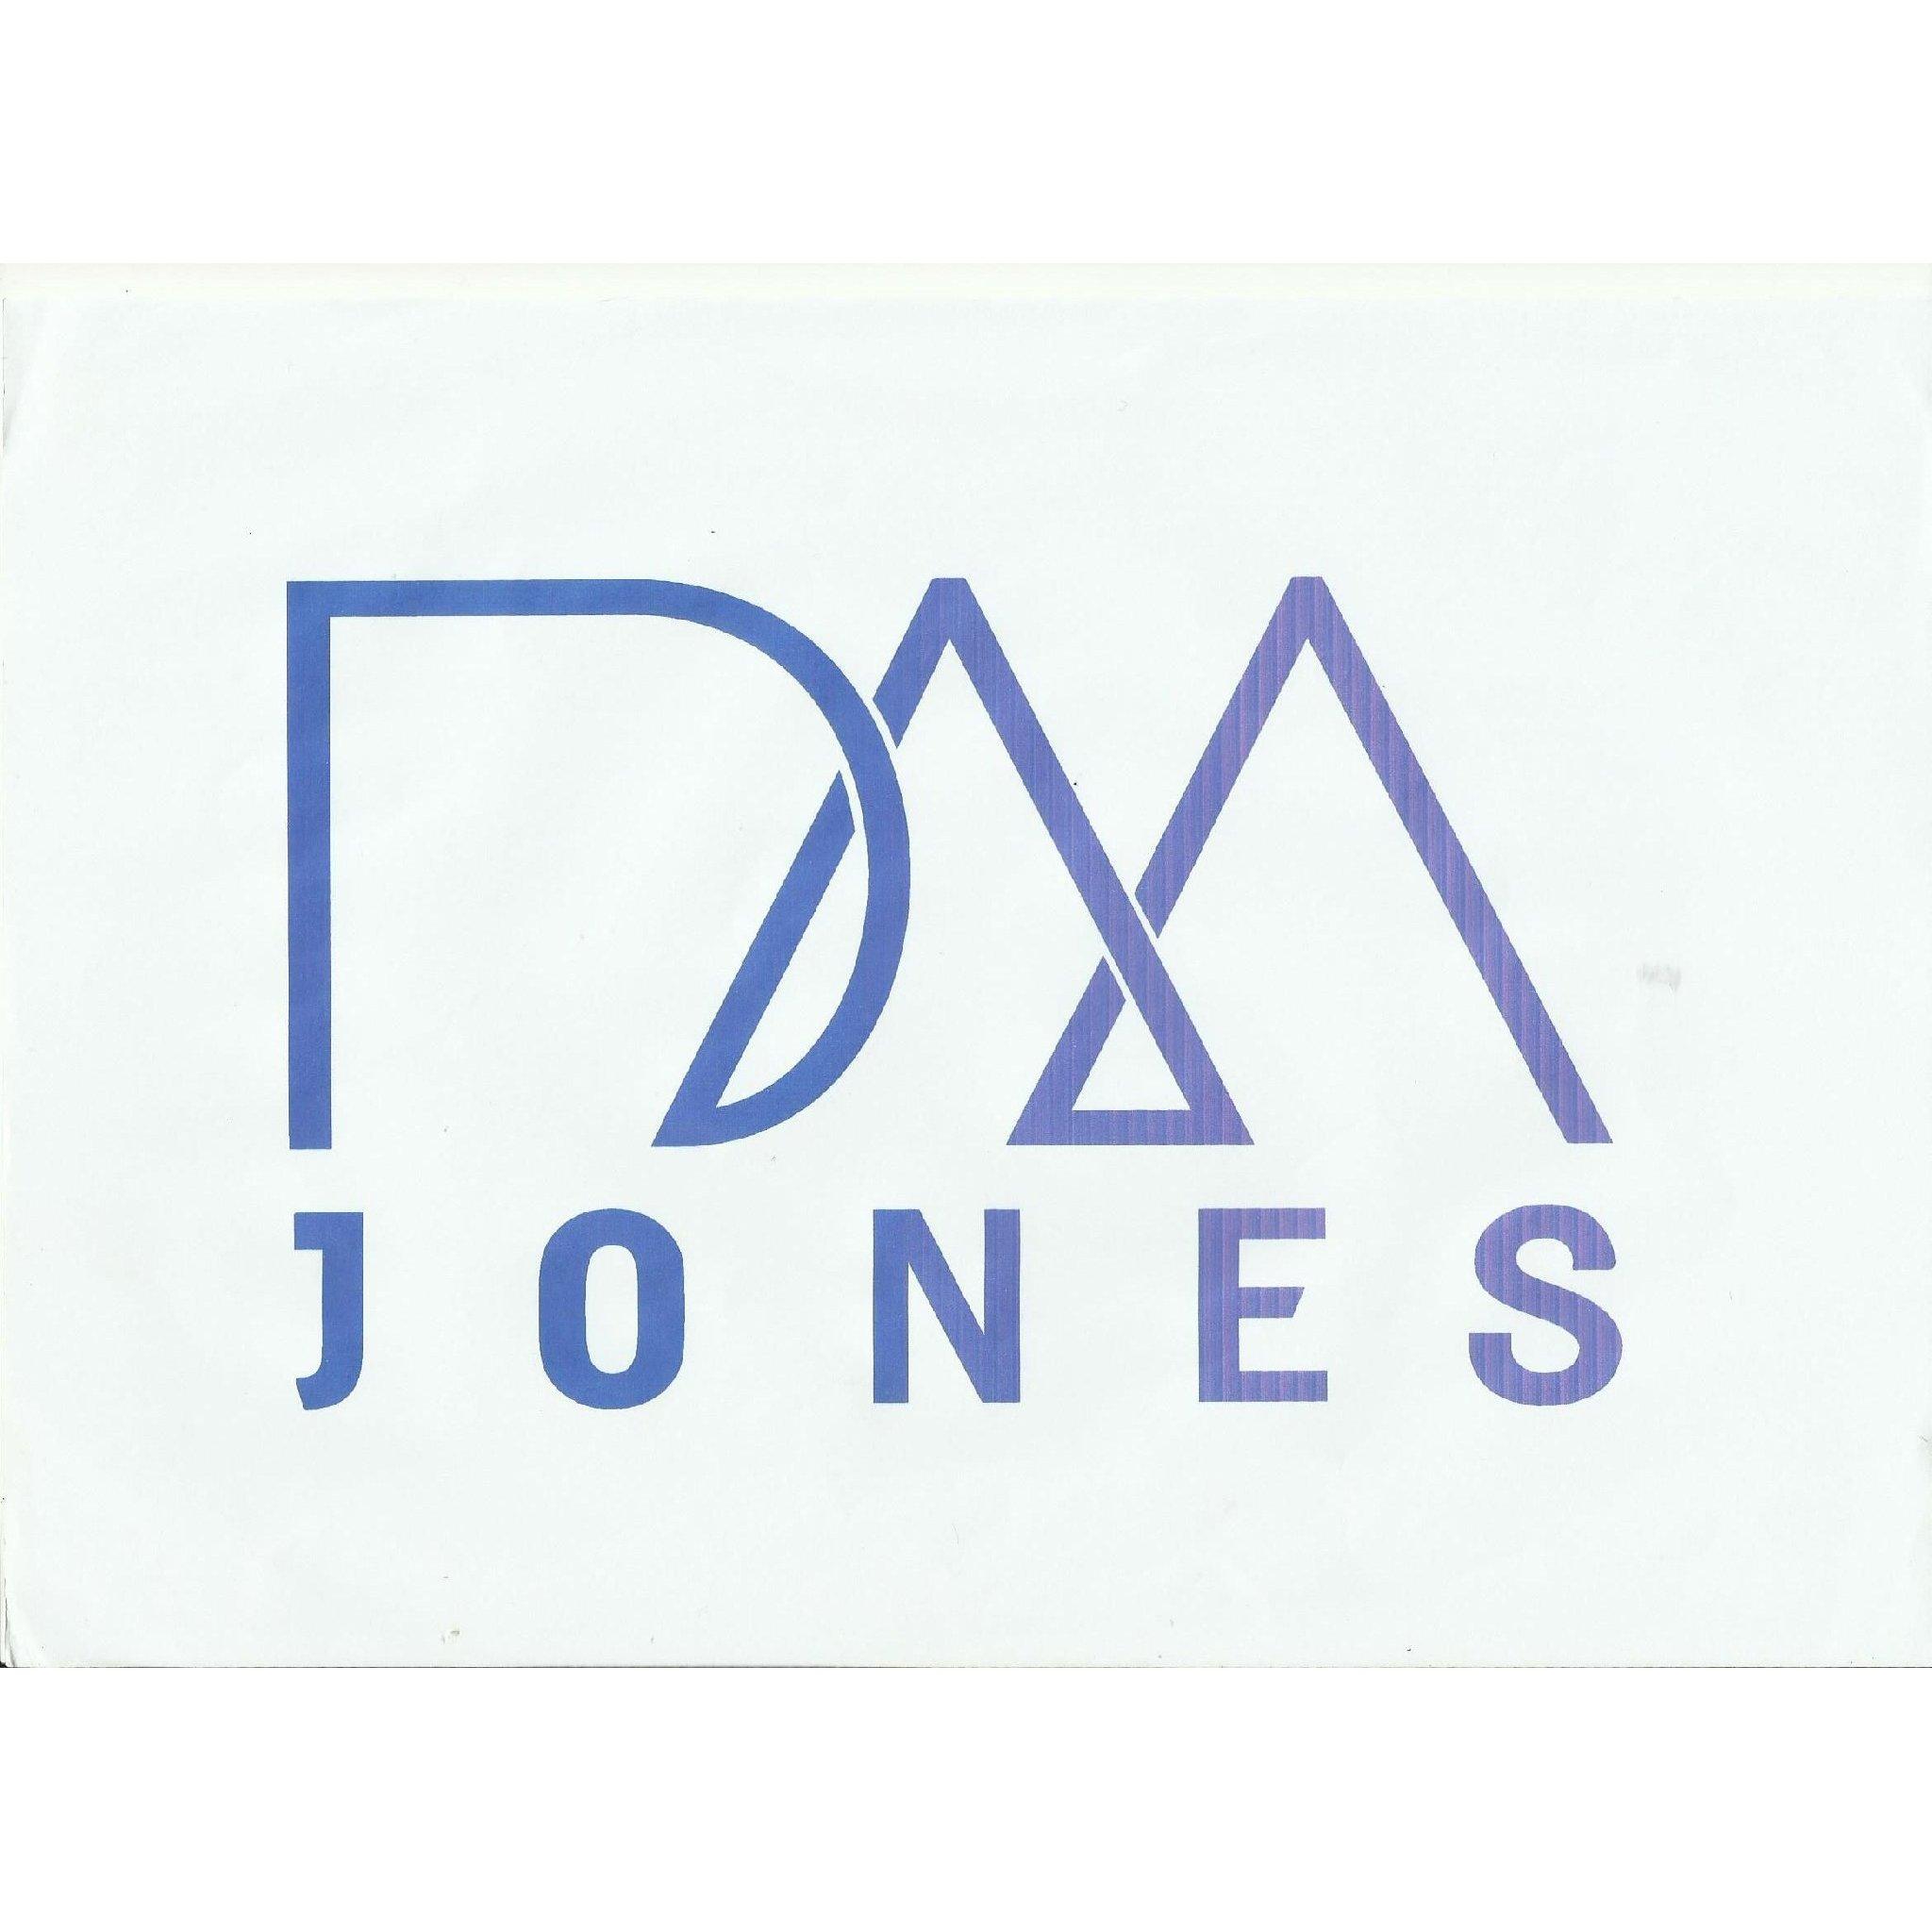 D & M Jones - Brecon, Powys LD3 8AN - 07970 814668 | ShowMeLocal.com